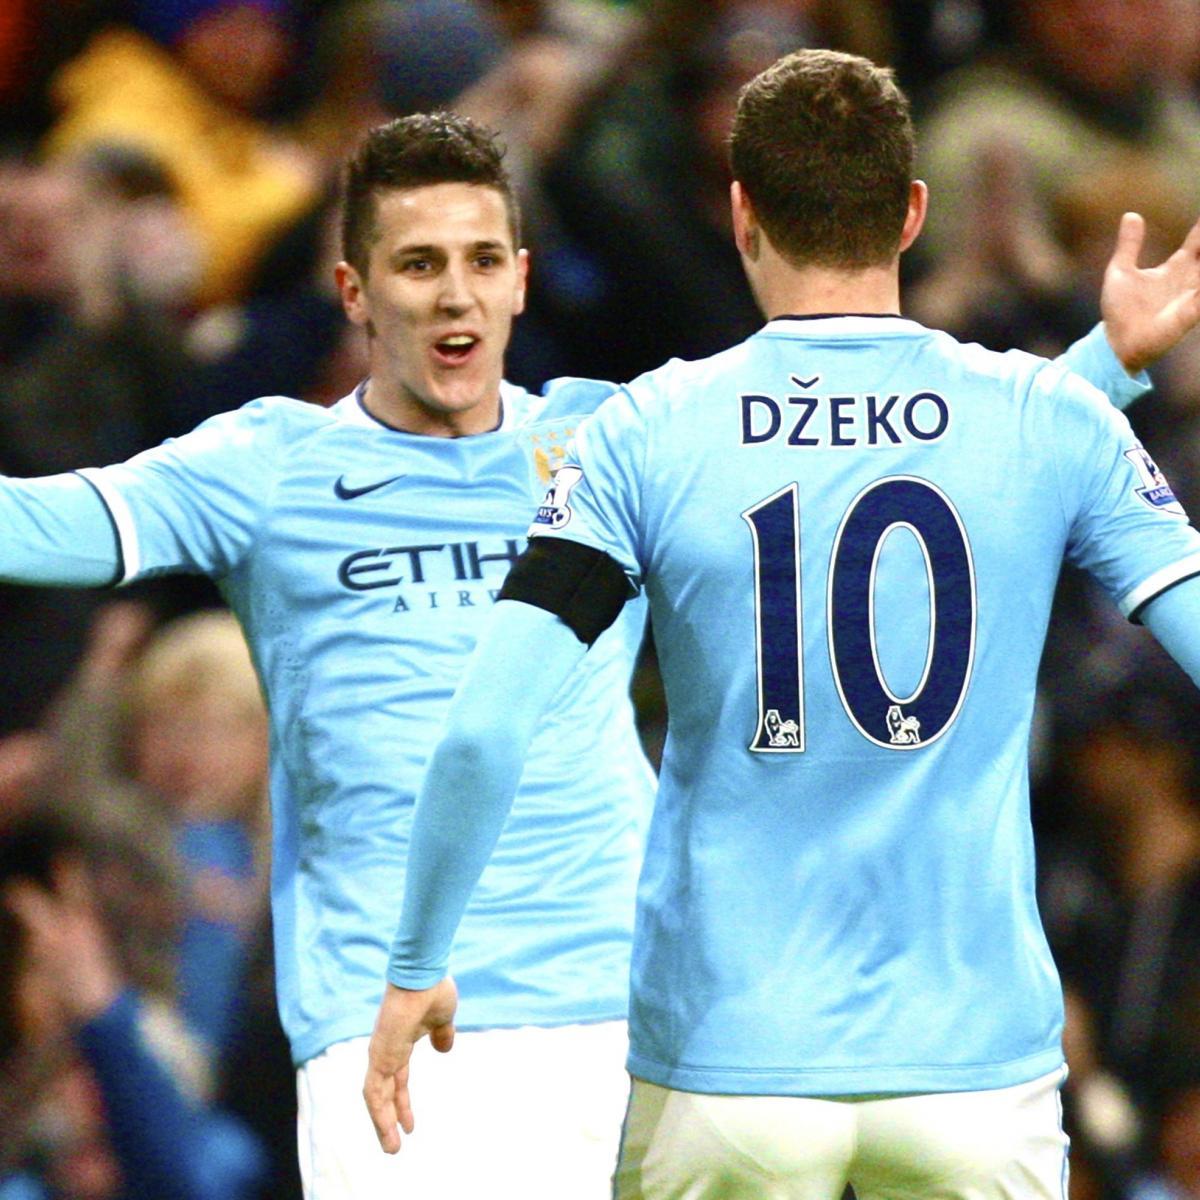 Psg Vs Manchester City Live Score Highlights From: Manchester City Vs. Chelsea: FA Cup Live Score, Highlights